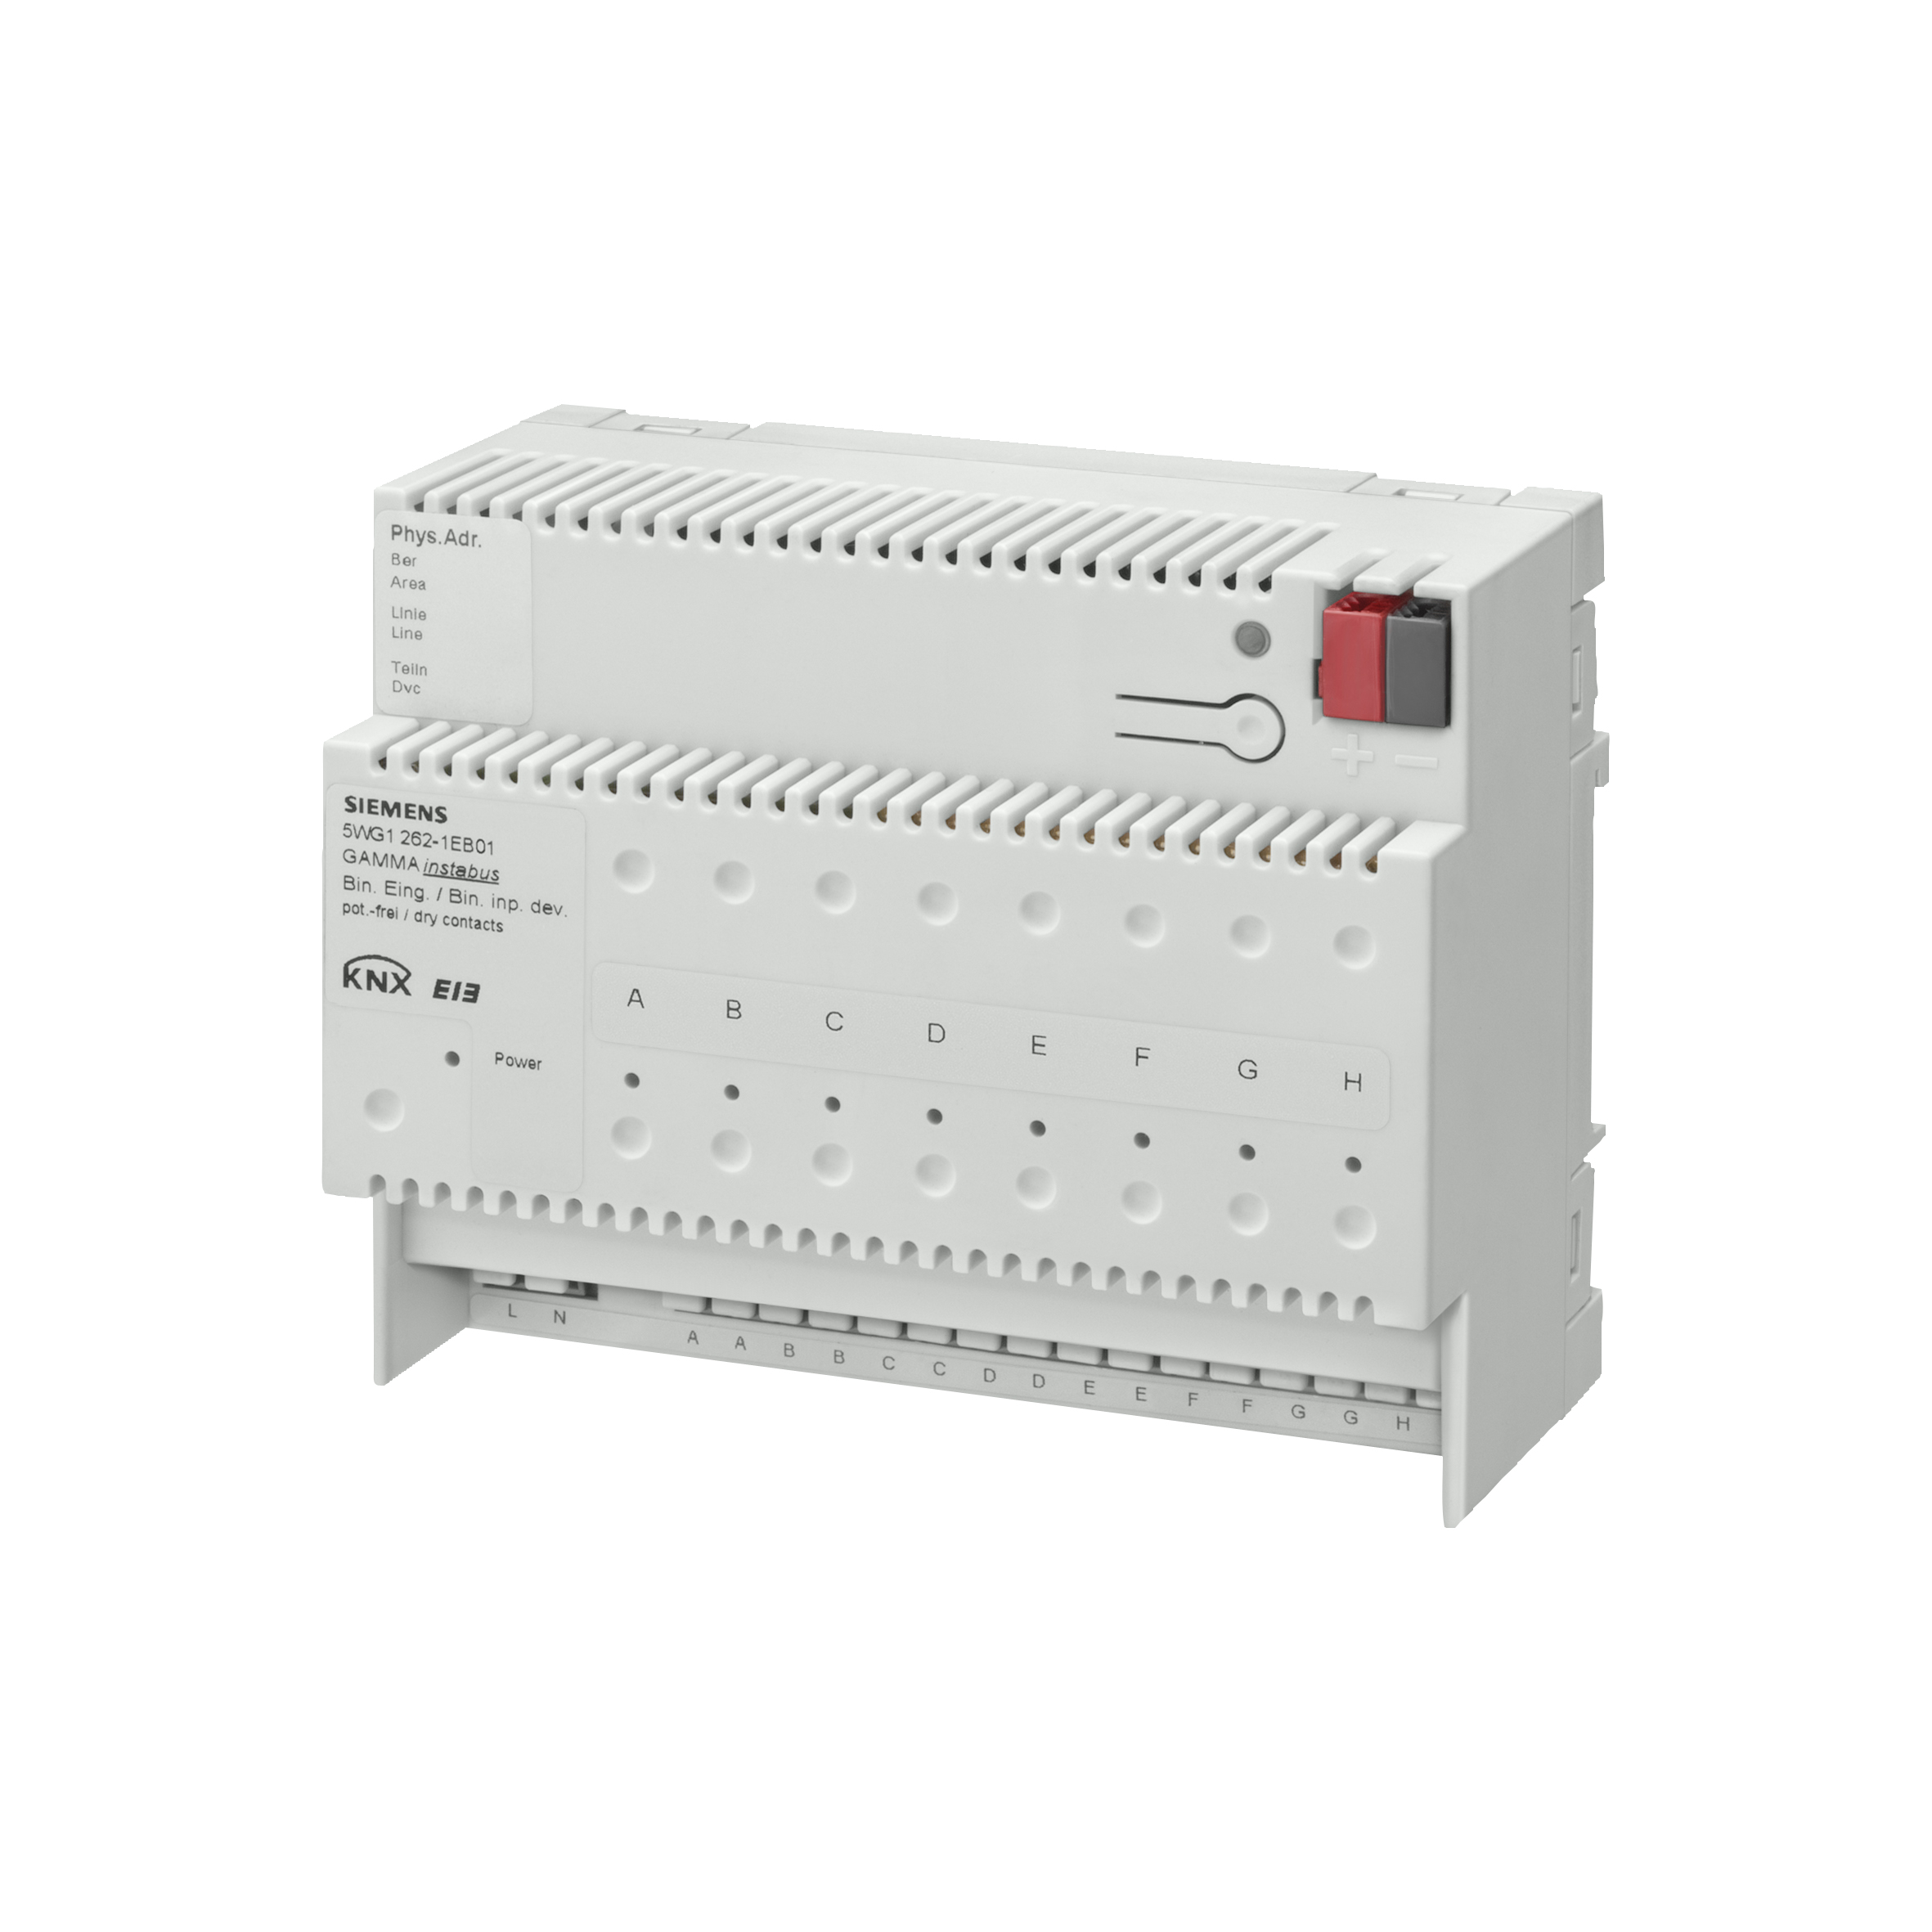 1 Stk Binäreingabegerät, 8 Eingänge für potentialfreie Kontakte KX2621EB01